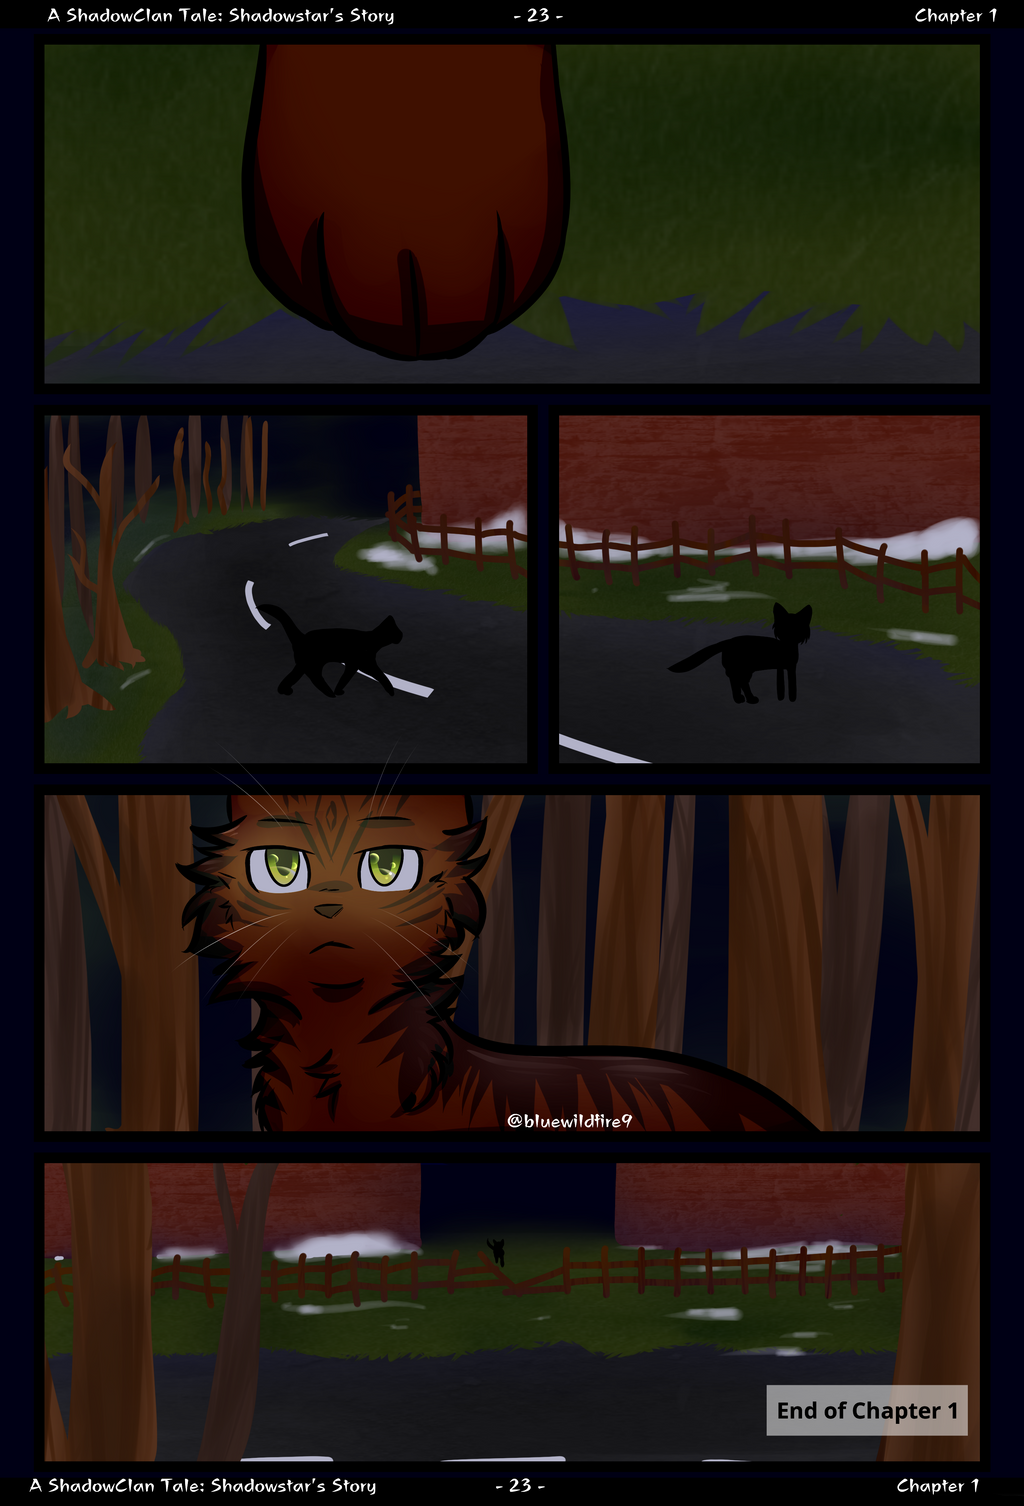 A ShadowClan Tale: Shadowstar's Story - 23